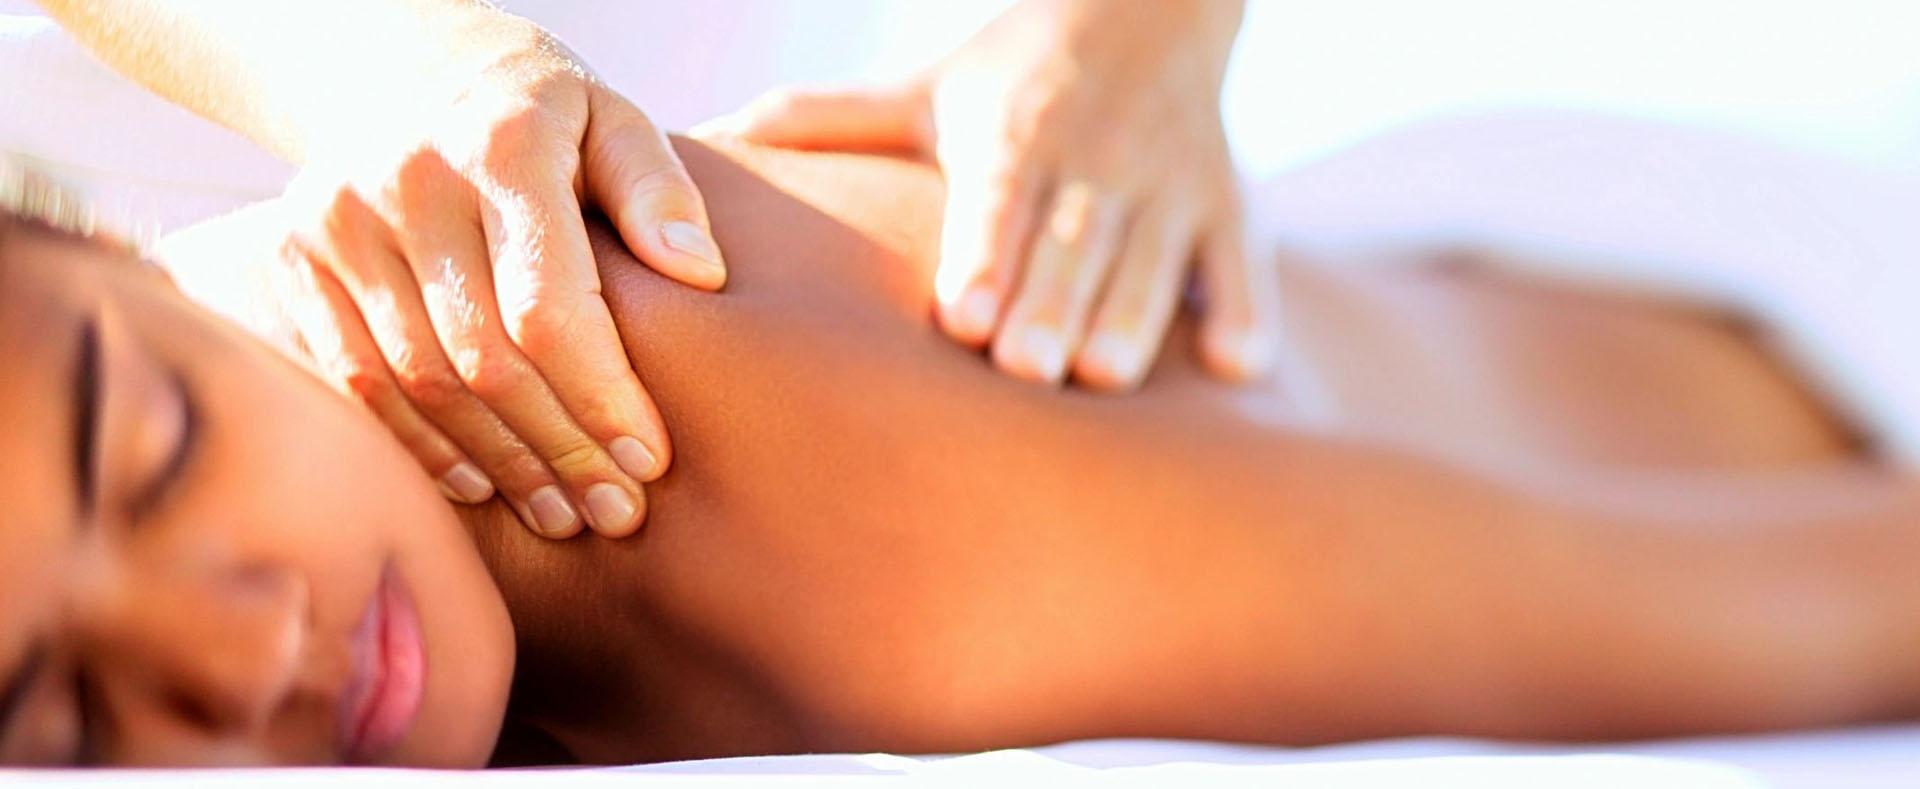 masage-new